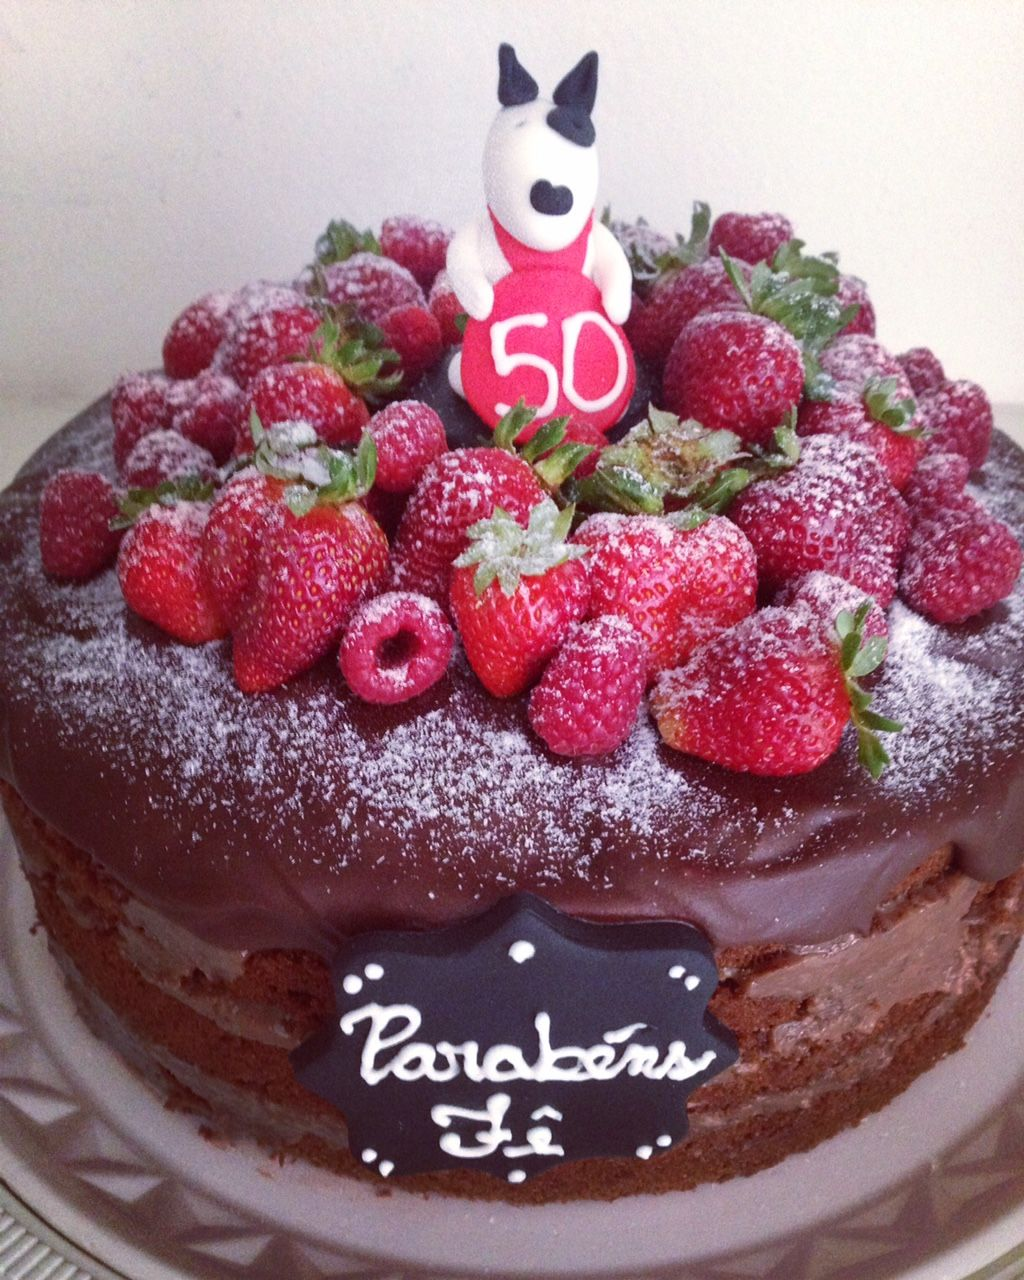 Chokolade nøgne kage fyldt med sød mælk og kokona topping en lækker Ganache-5833